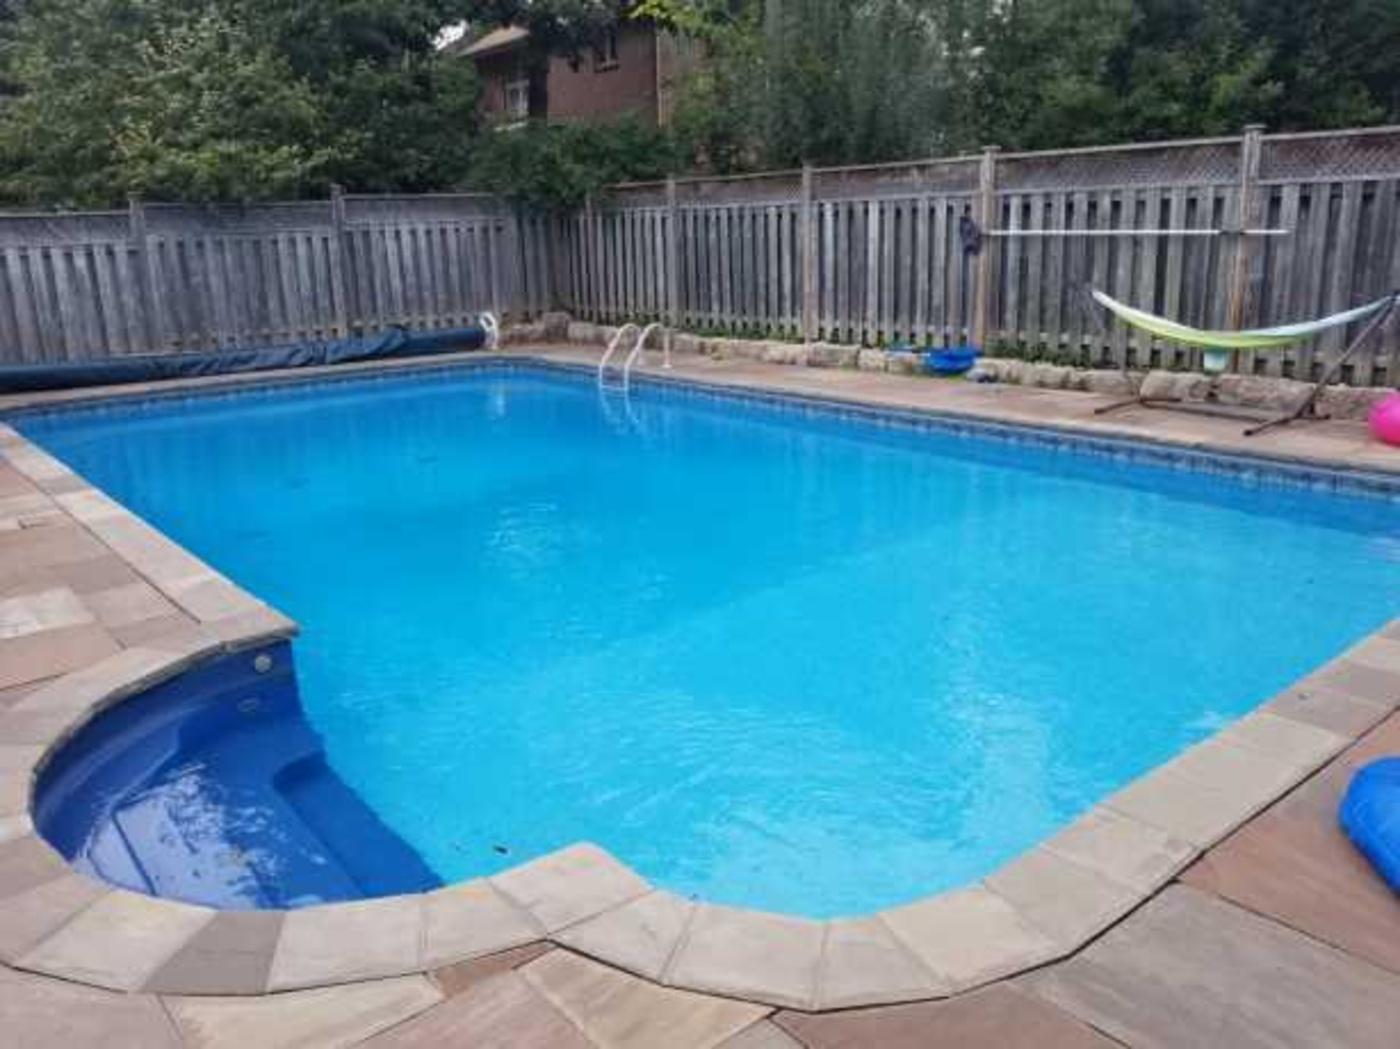 swimply pools toronto